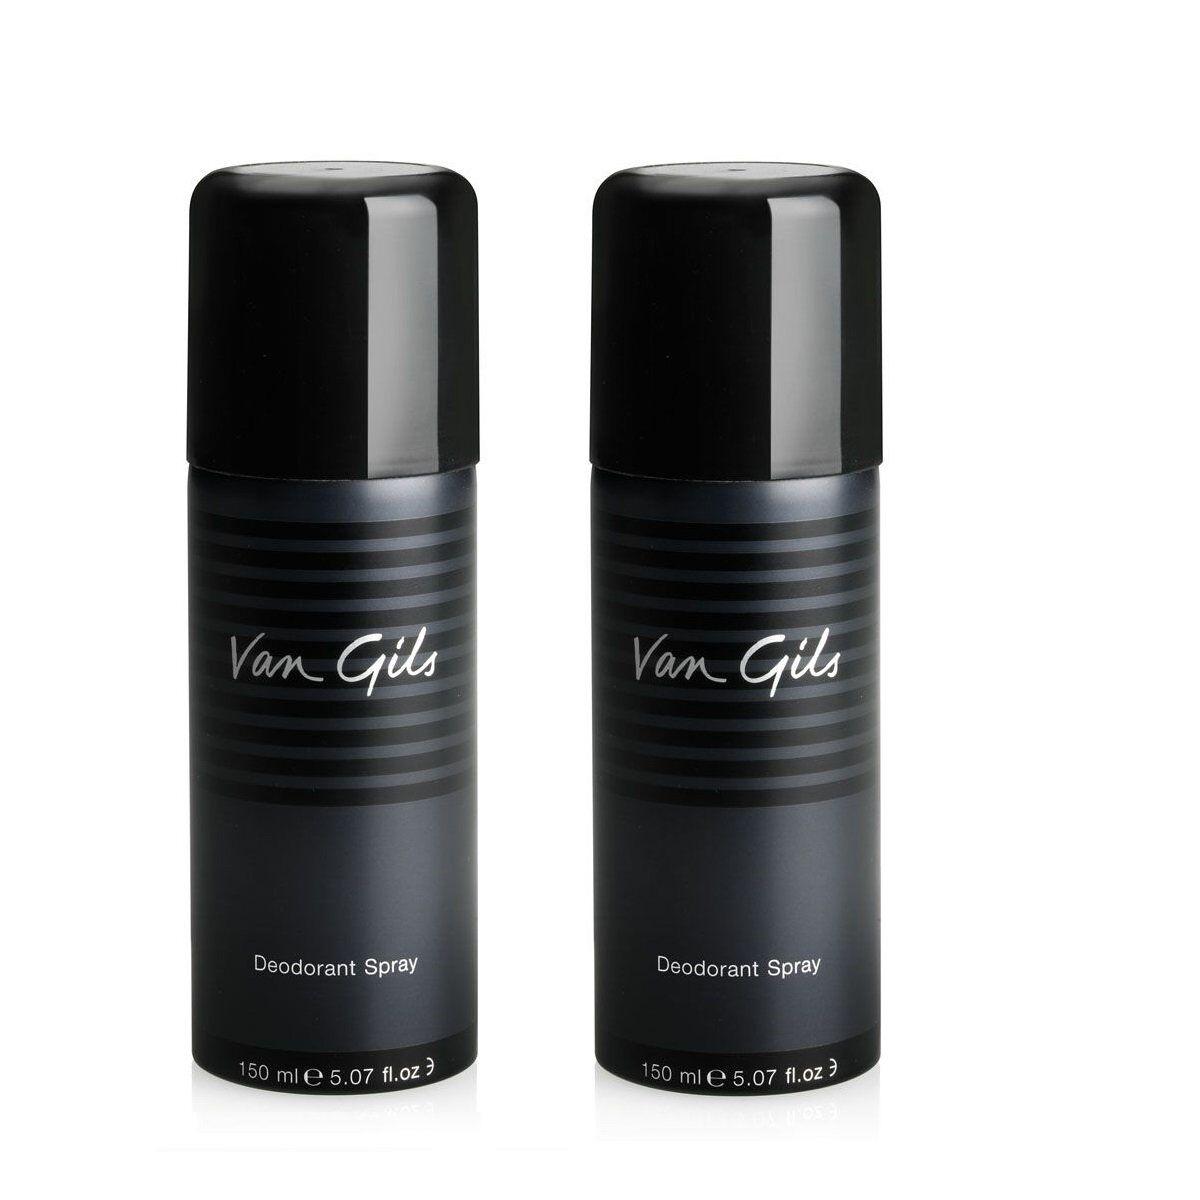 Van Gils 2x Strictly for Men Deodorant Spray 150 ml